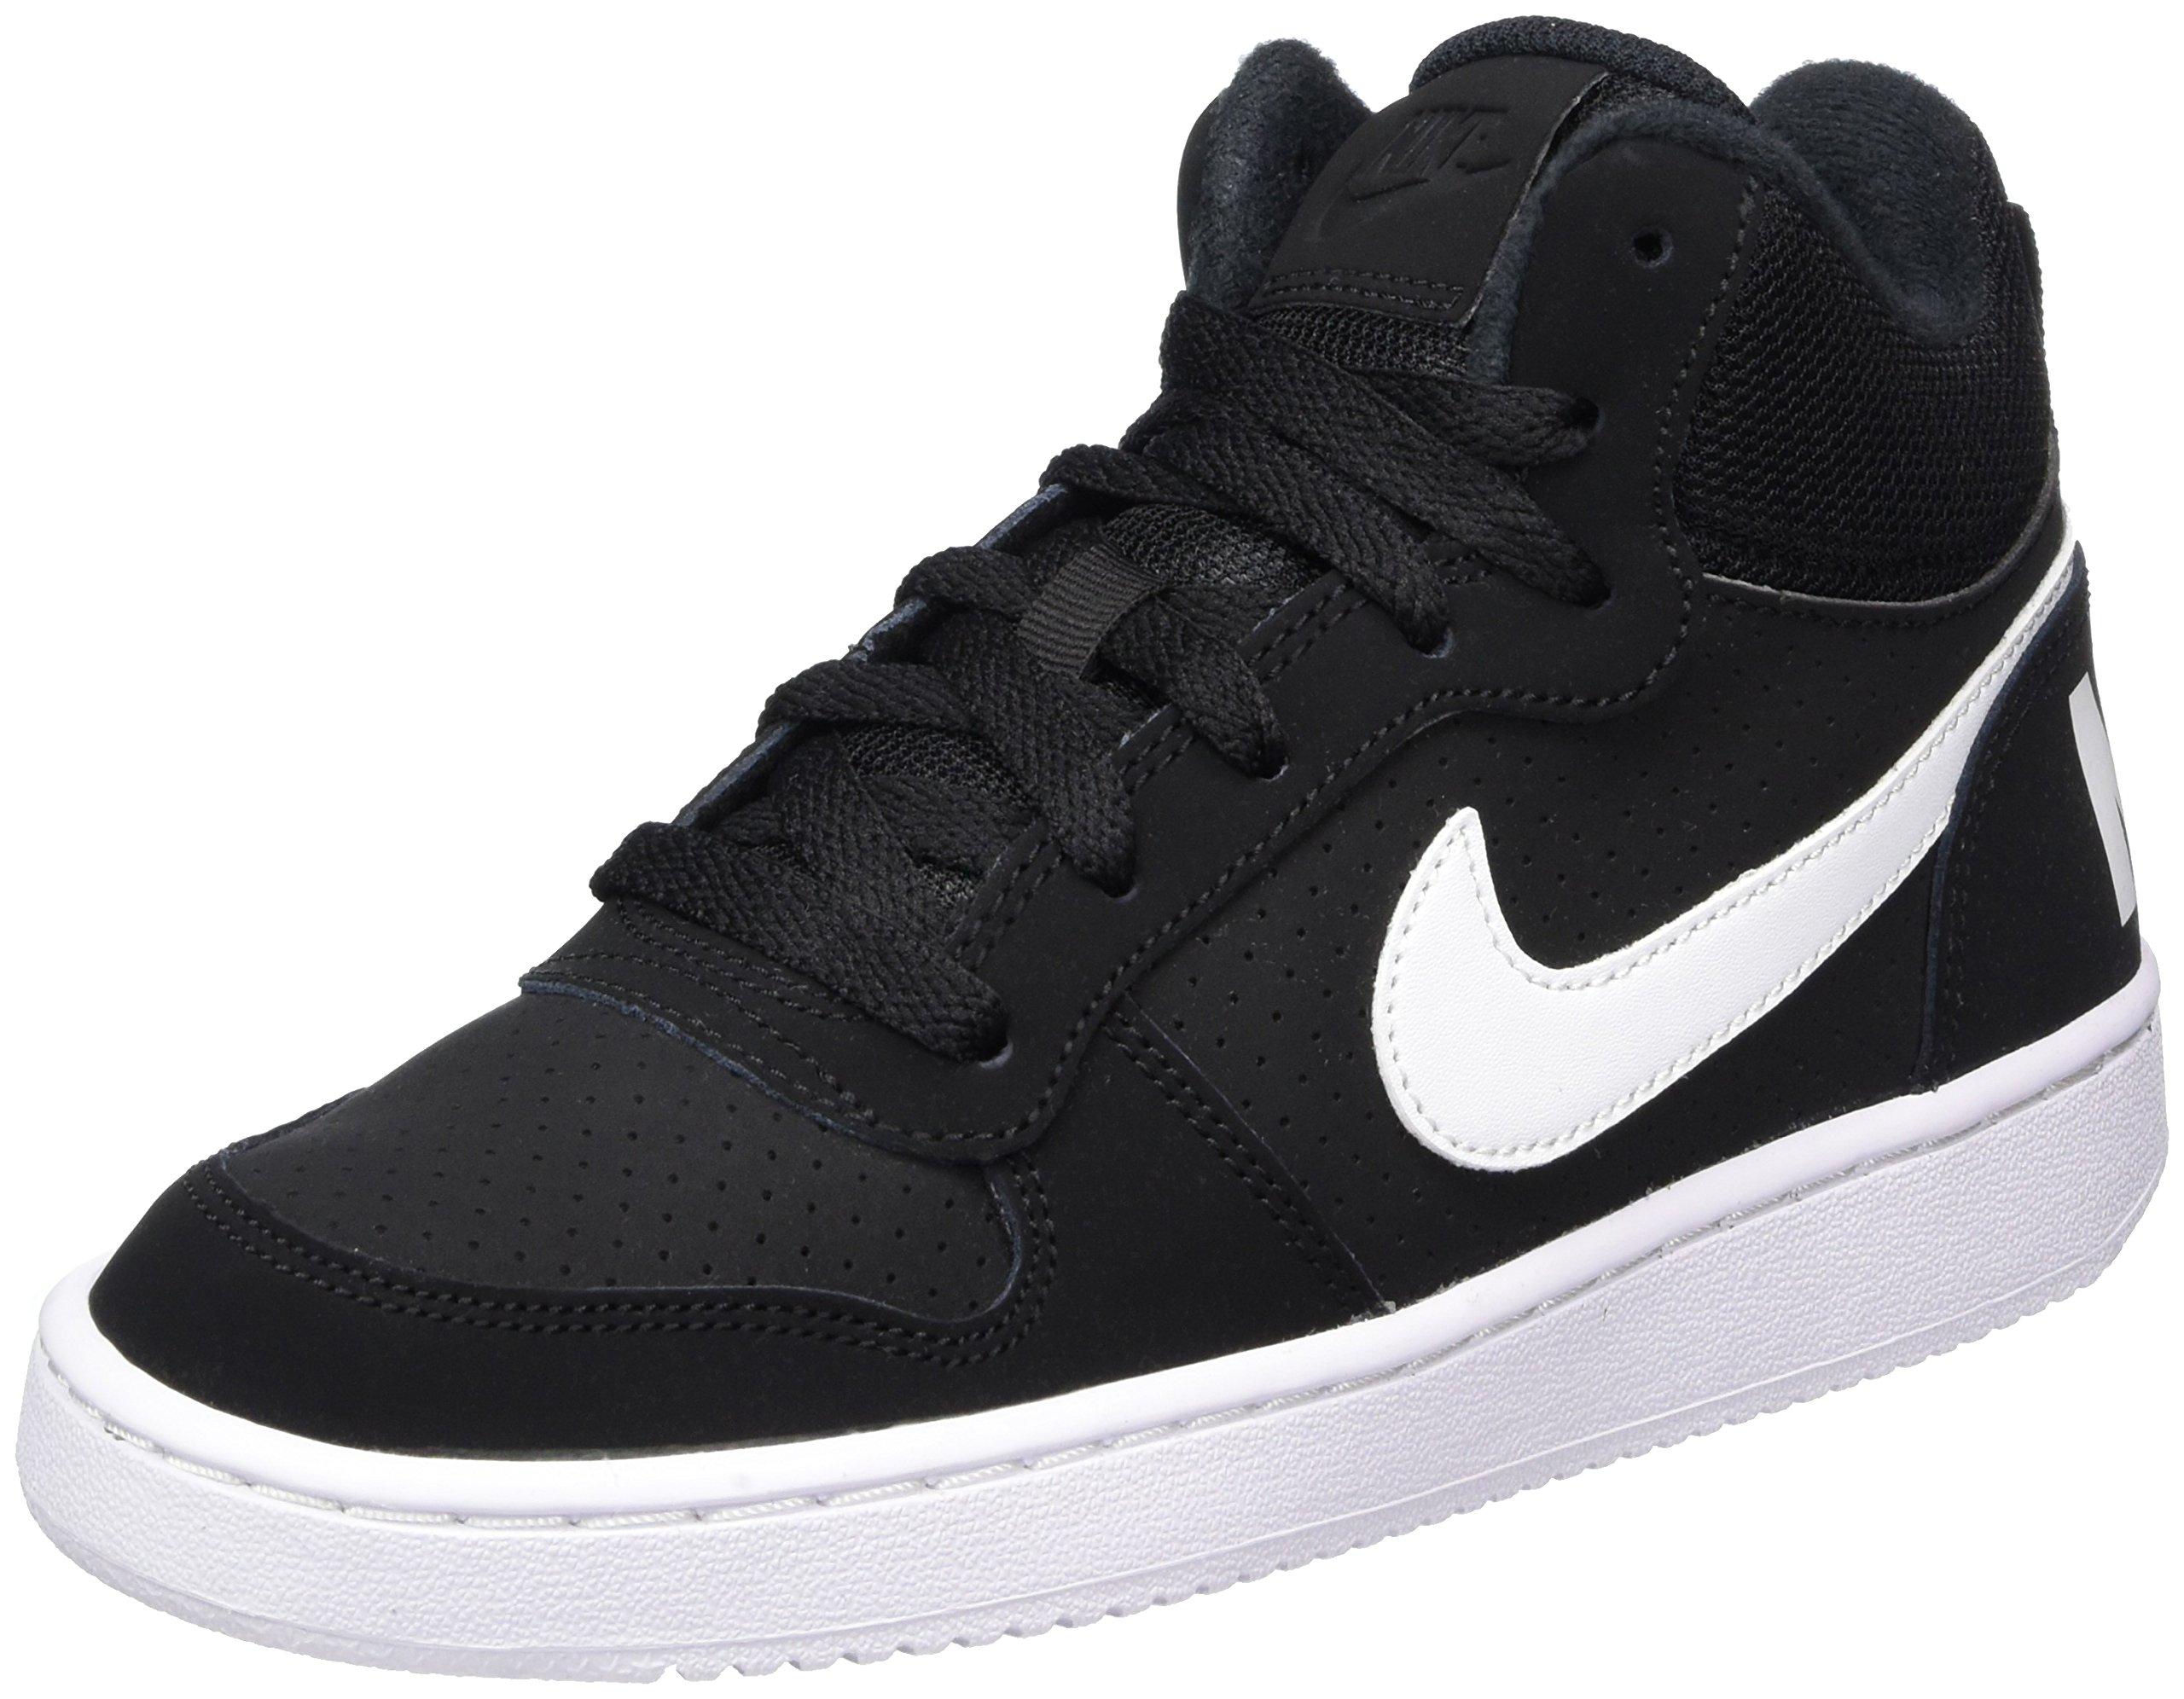 timeless design ab4a9 86c04 Galleon - Nike Court Borough Mid Big Kids Style Shoes   839977, Black White,  6